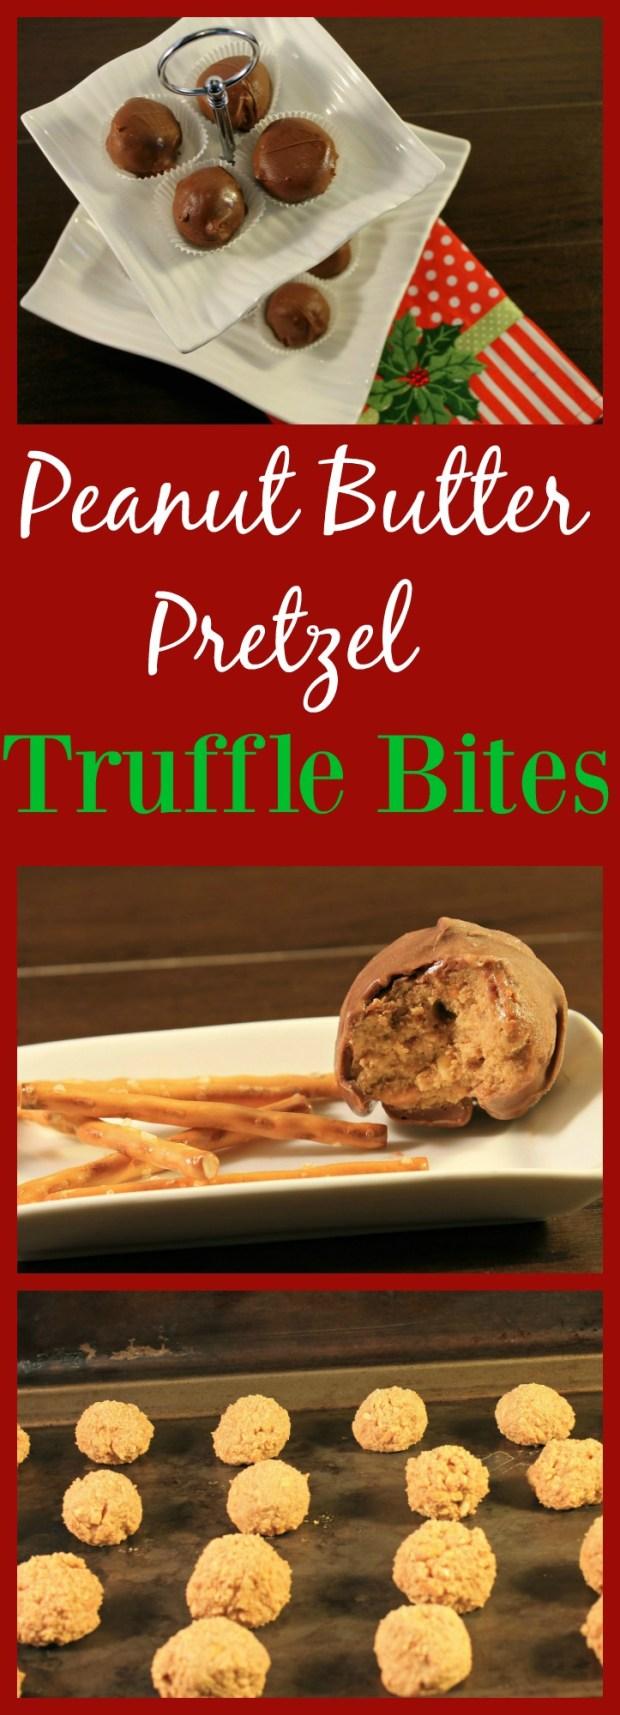 Peanut-Butter-Truffle-Bite